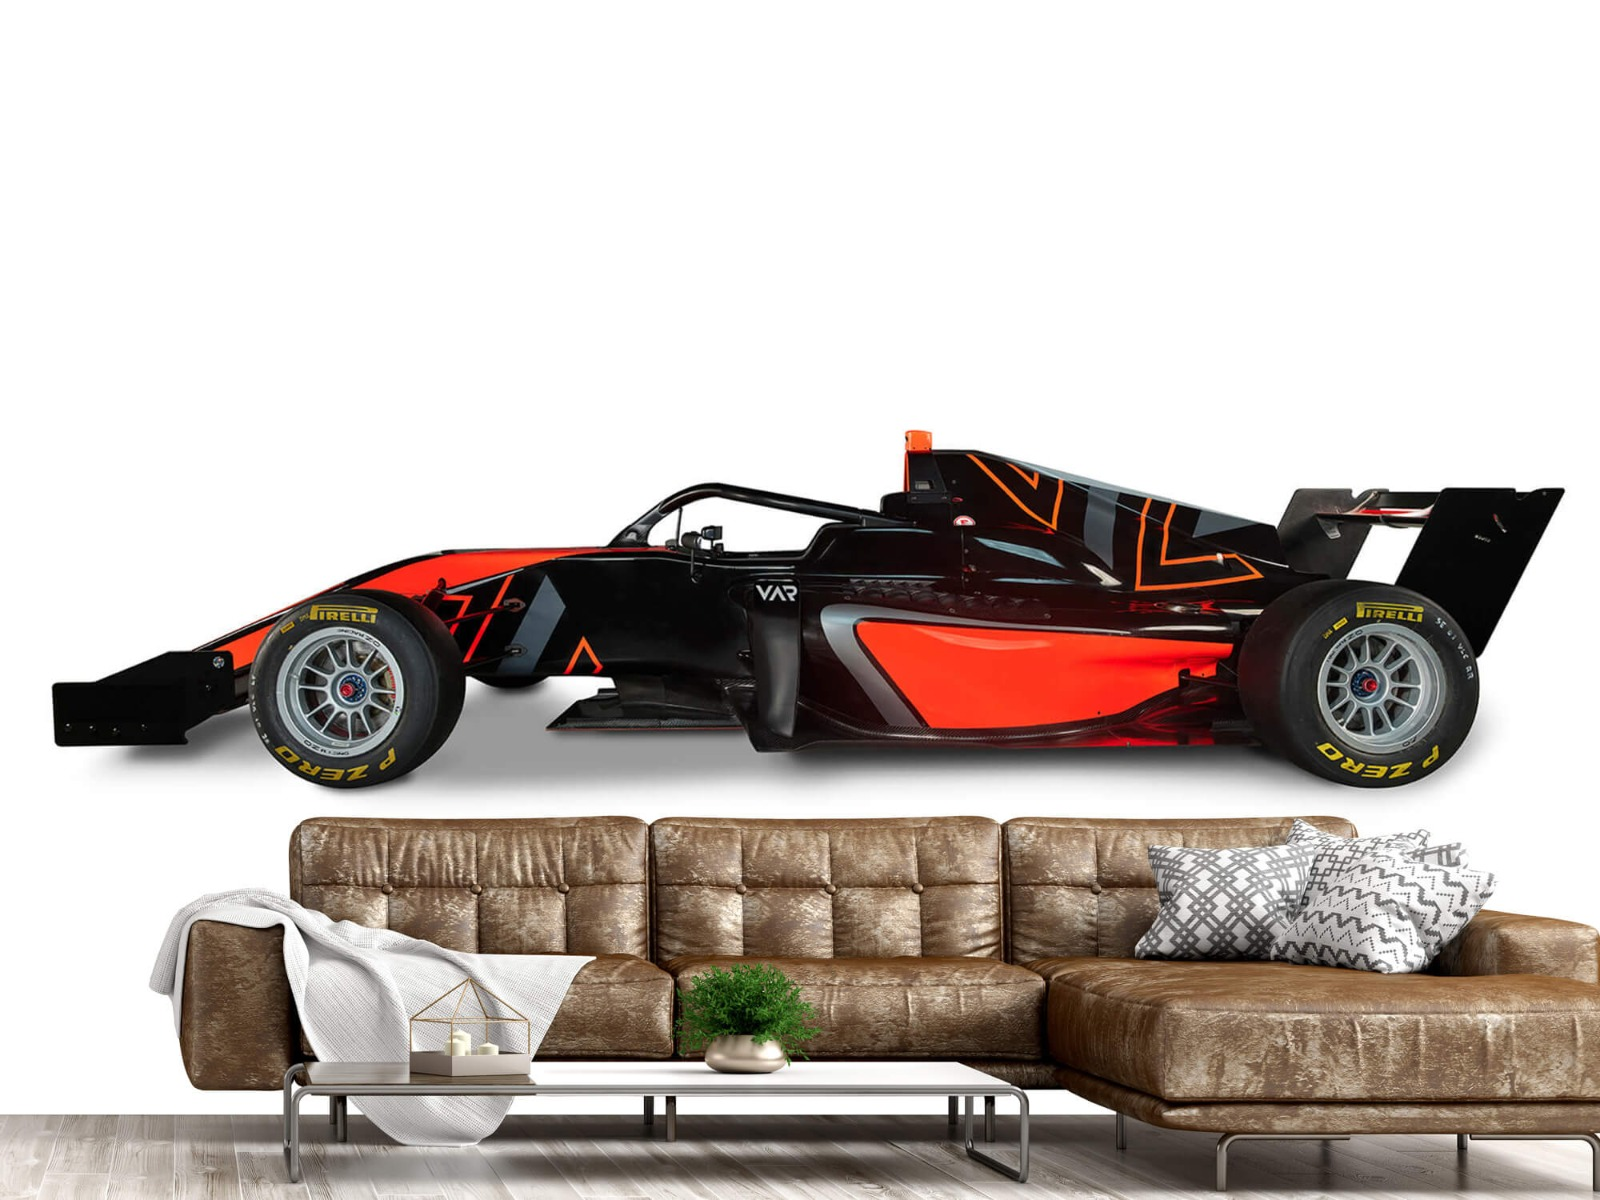 Sportauto's - Formule 3 - Lower side view - Computerruimte 14